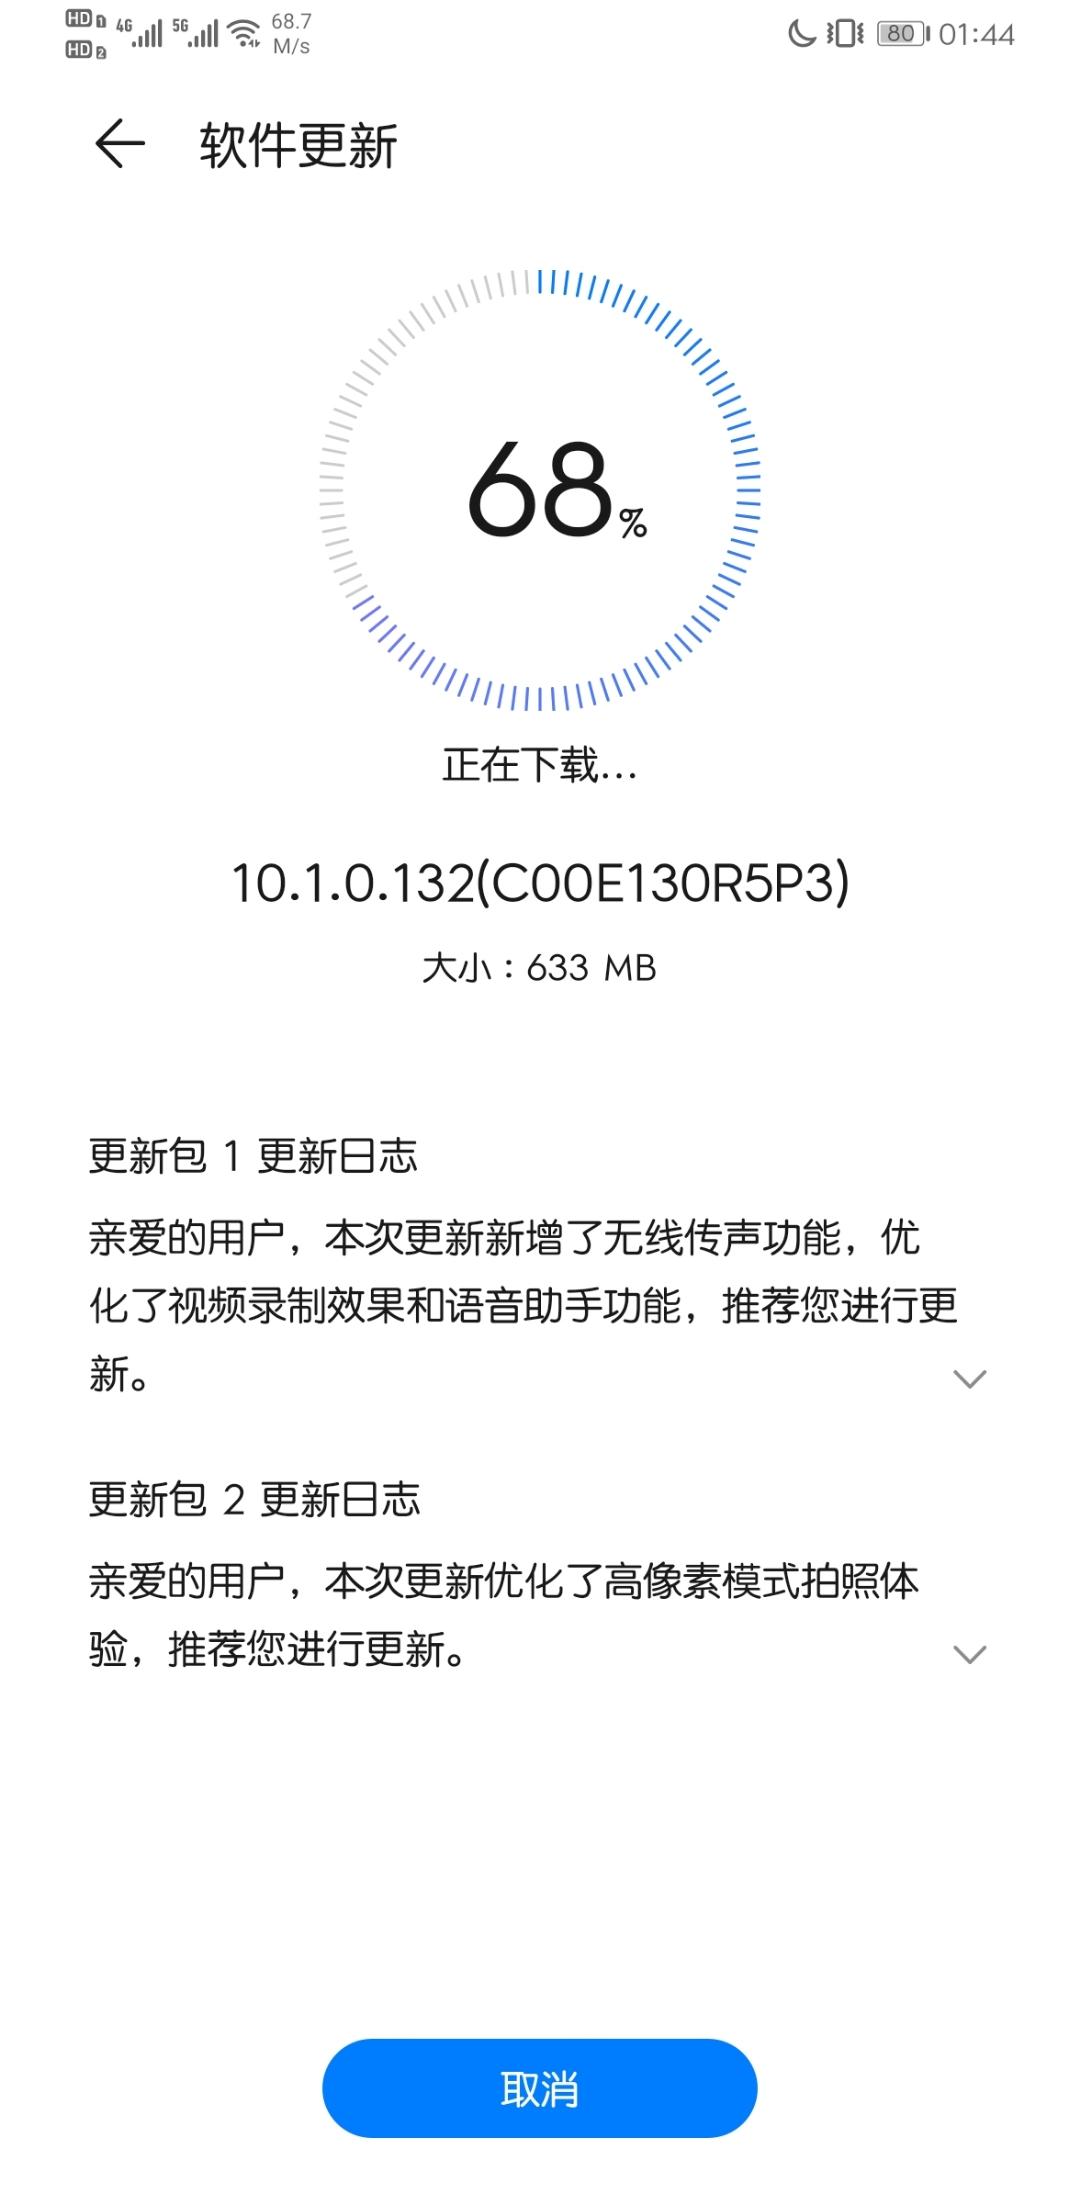 Screenshot_20200515_014439_com.huawei.android.hwouc.jpg